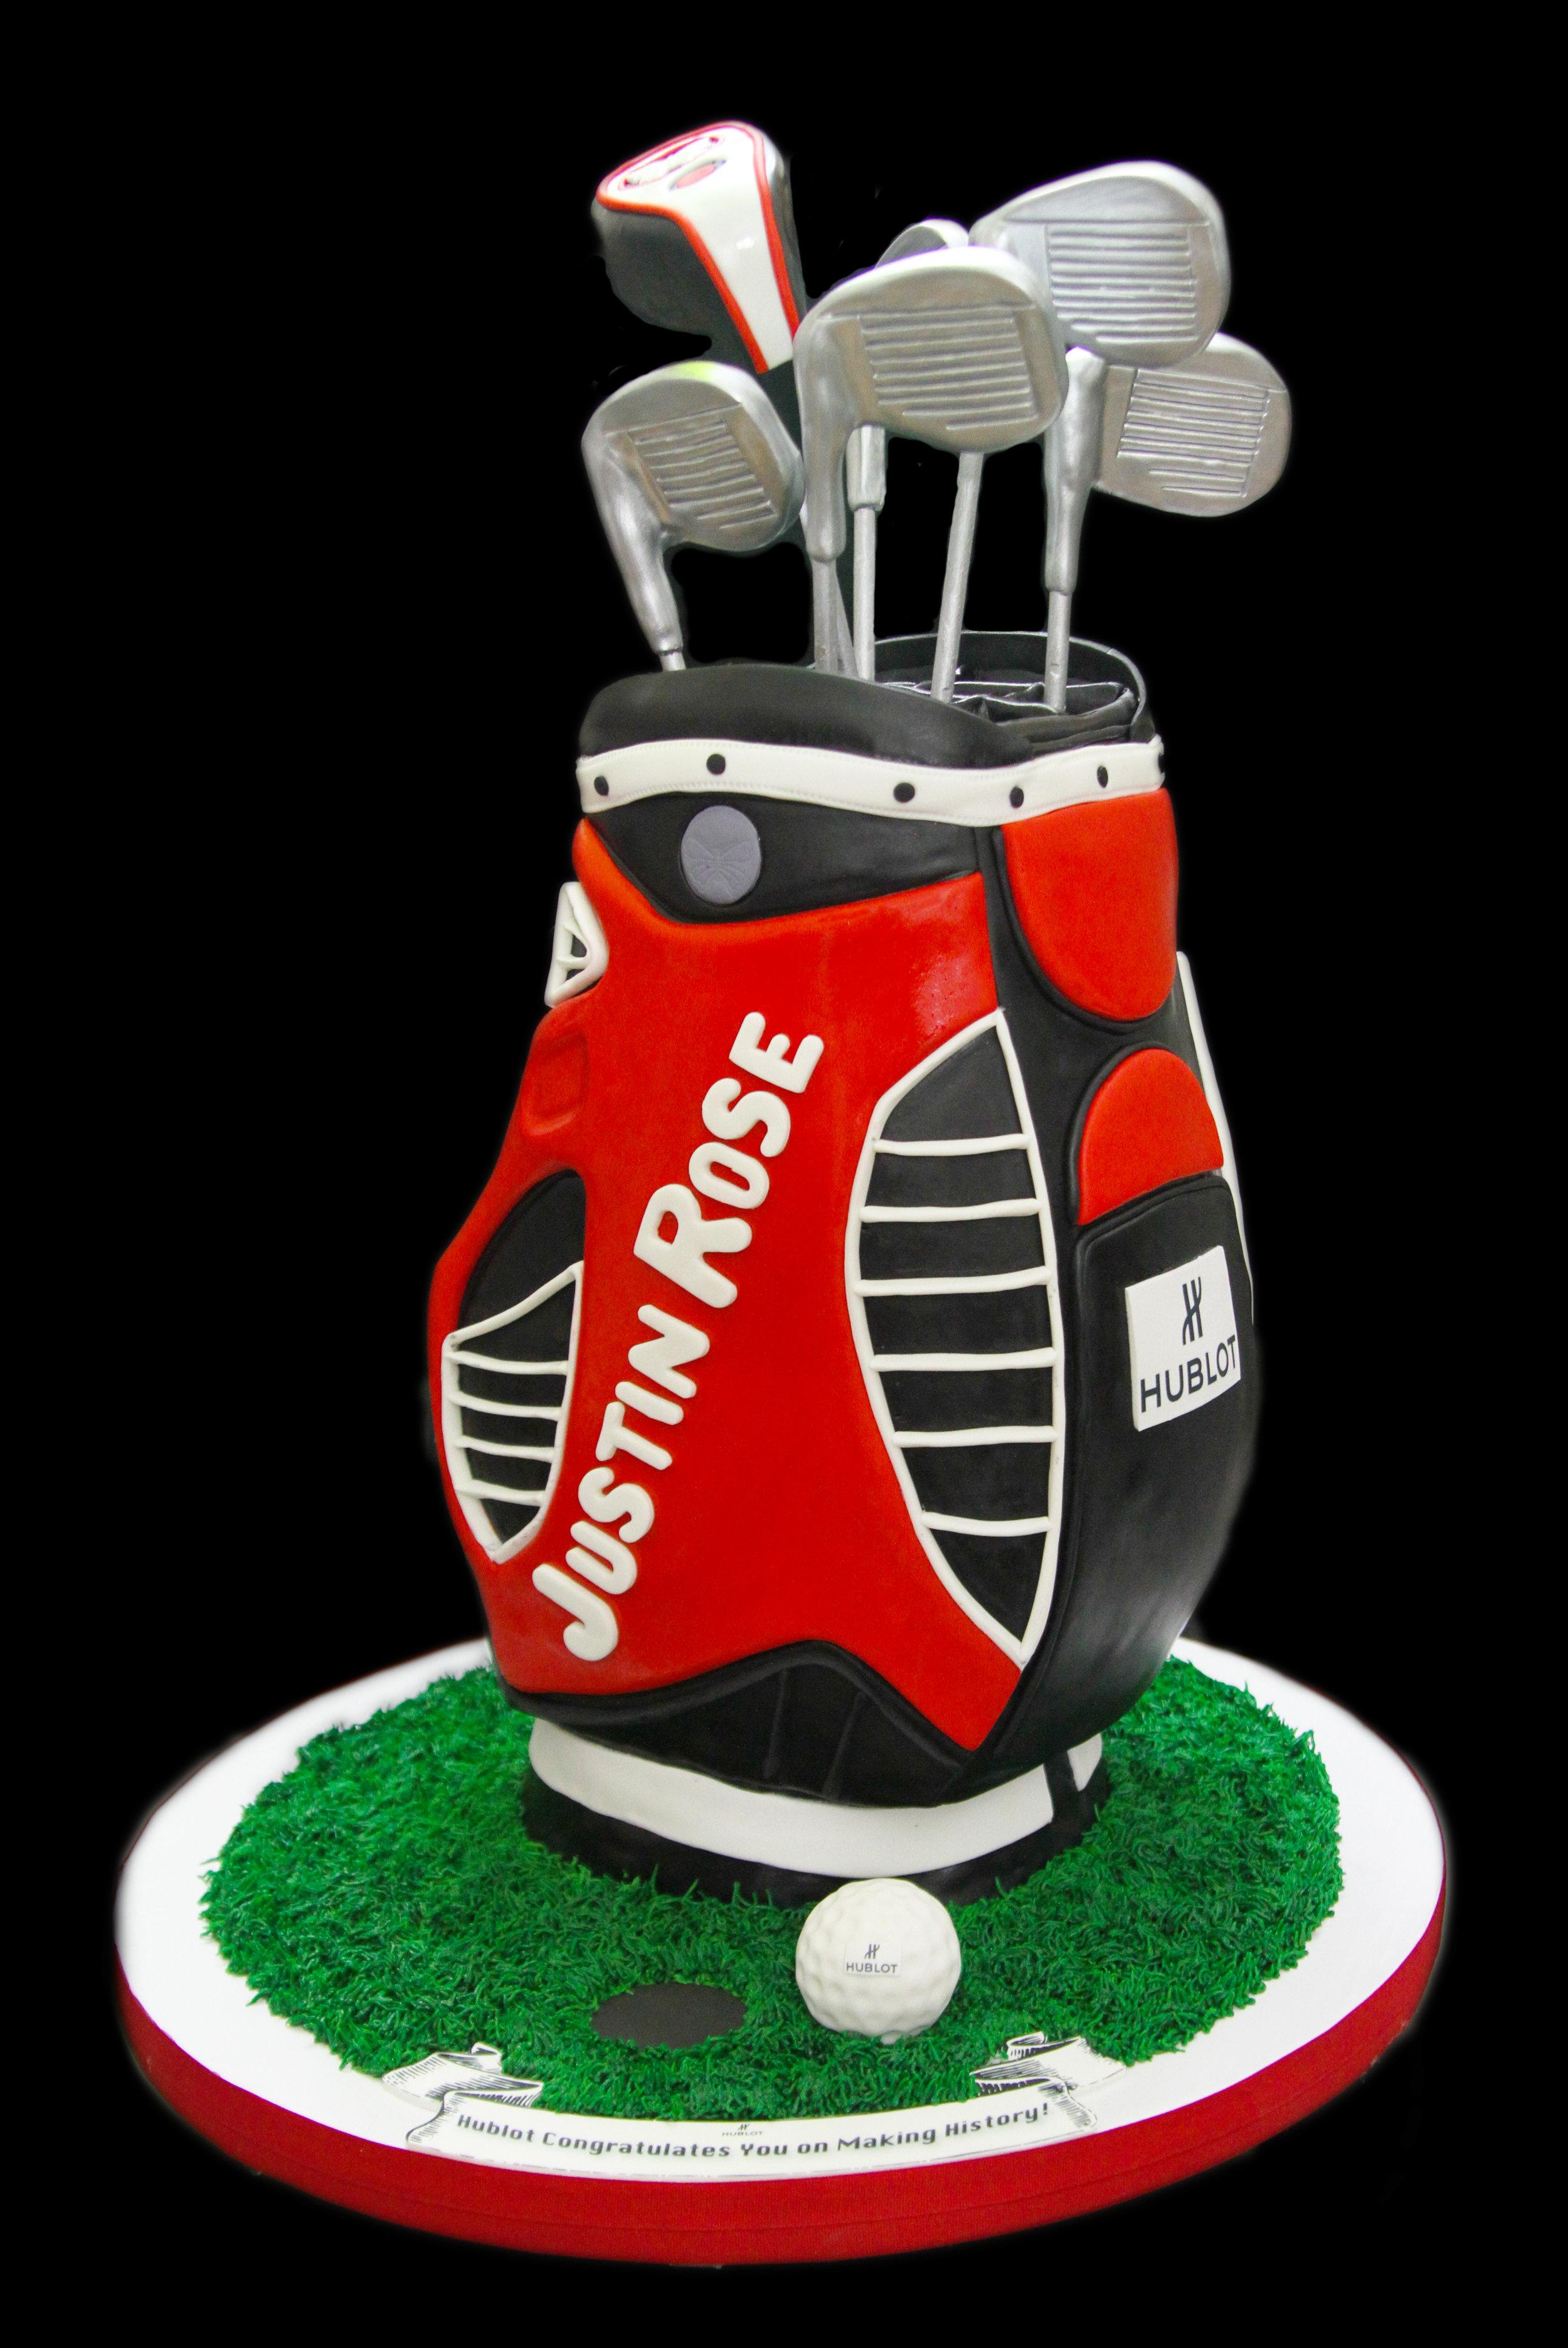 Justin Rose Golf Bag Cake.jpg